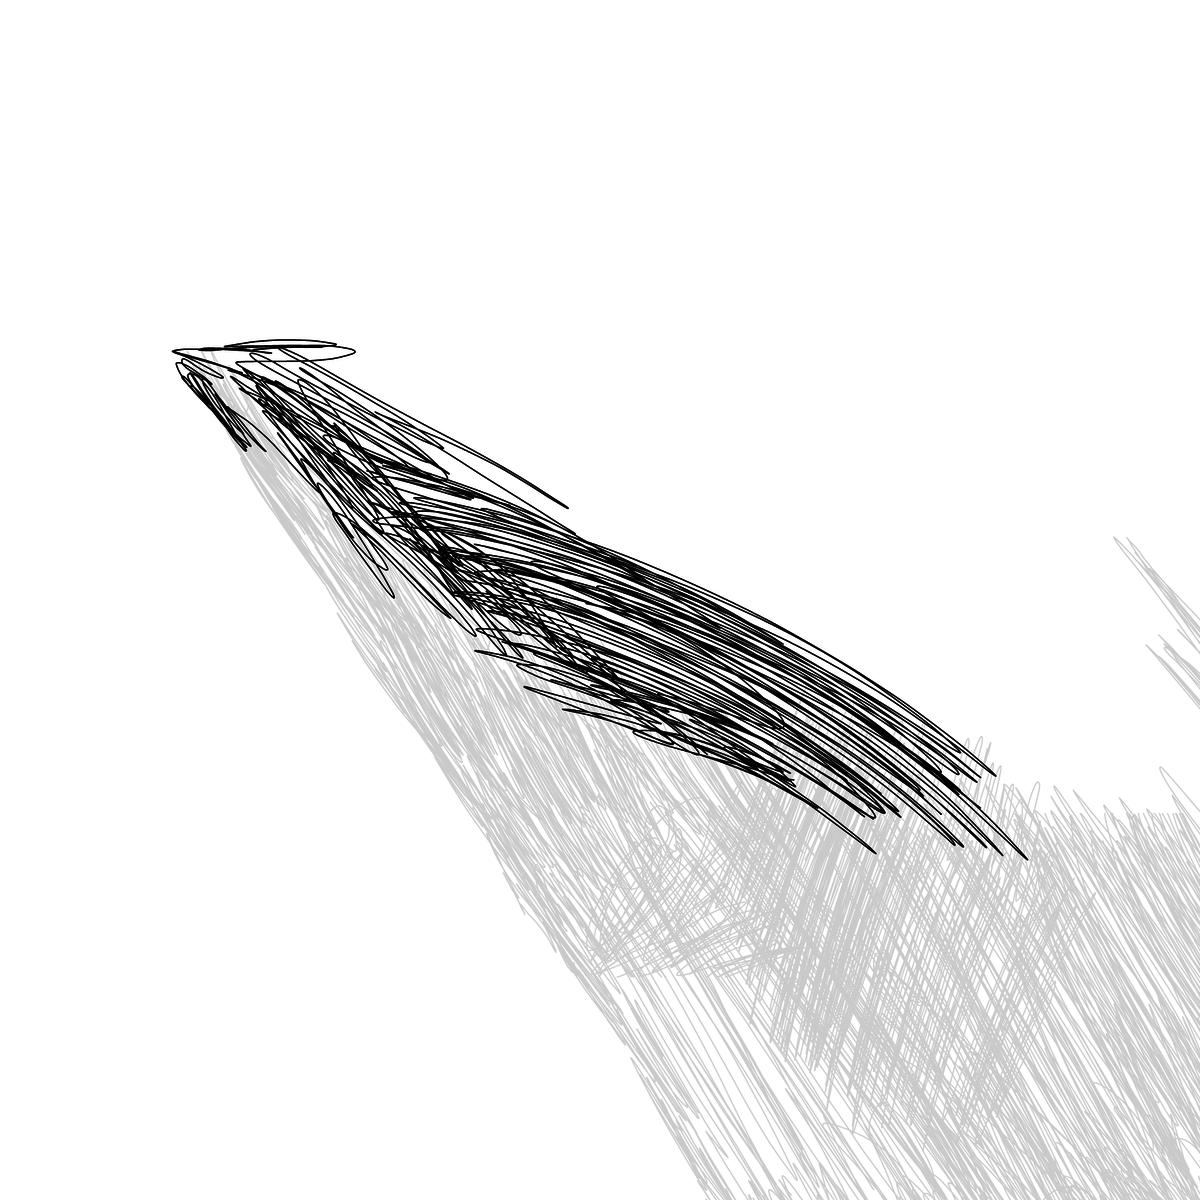 BAAAM drawing#8126 lat:52.4880599975585940lng: 13.4252424240112300